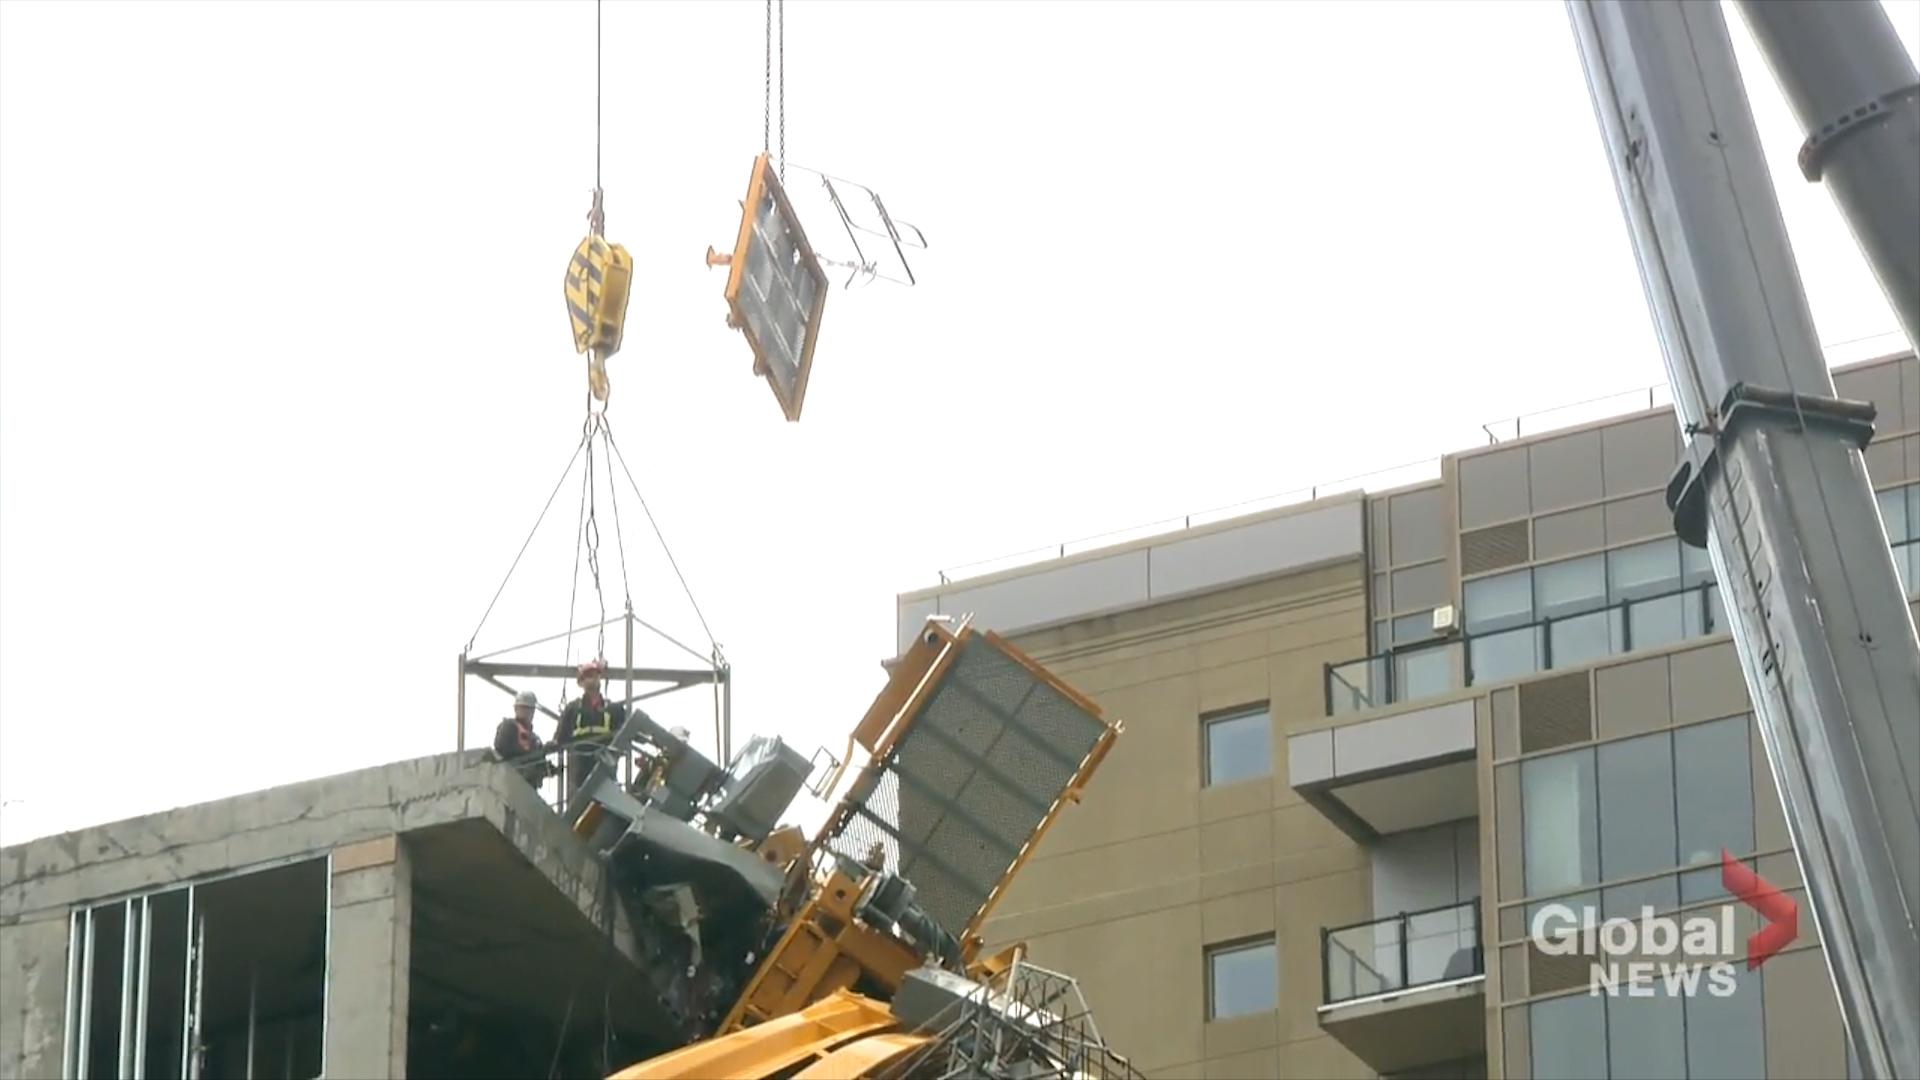 Work underway to dismantle toppled crane in Halifax that fell during Hurricane Dorian